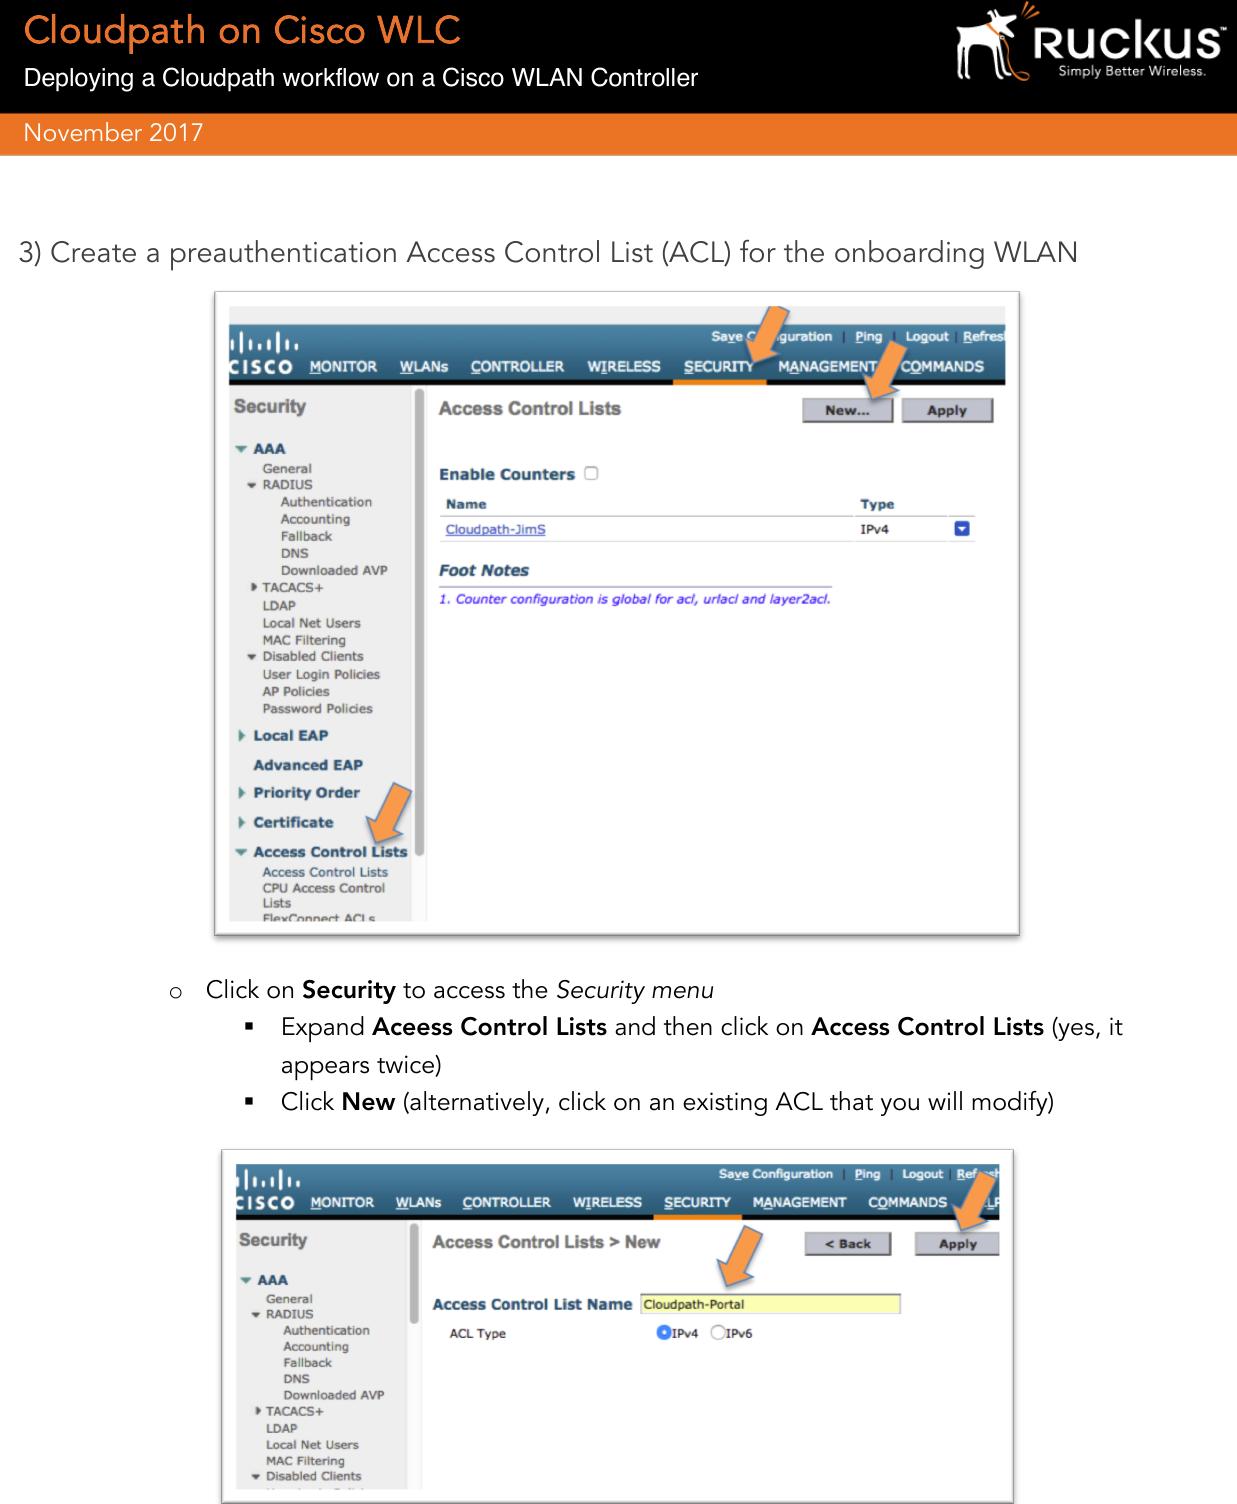 Ruckus BPDG Deploy Cloudpath Workflow On Cisco WLC BPG: